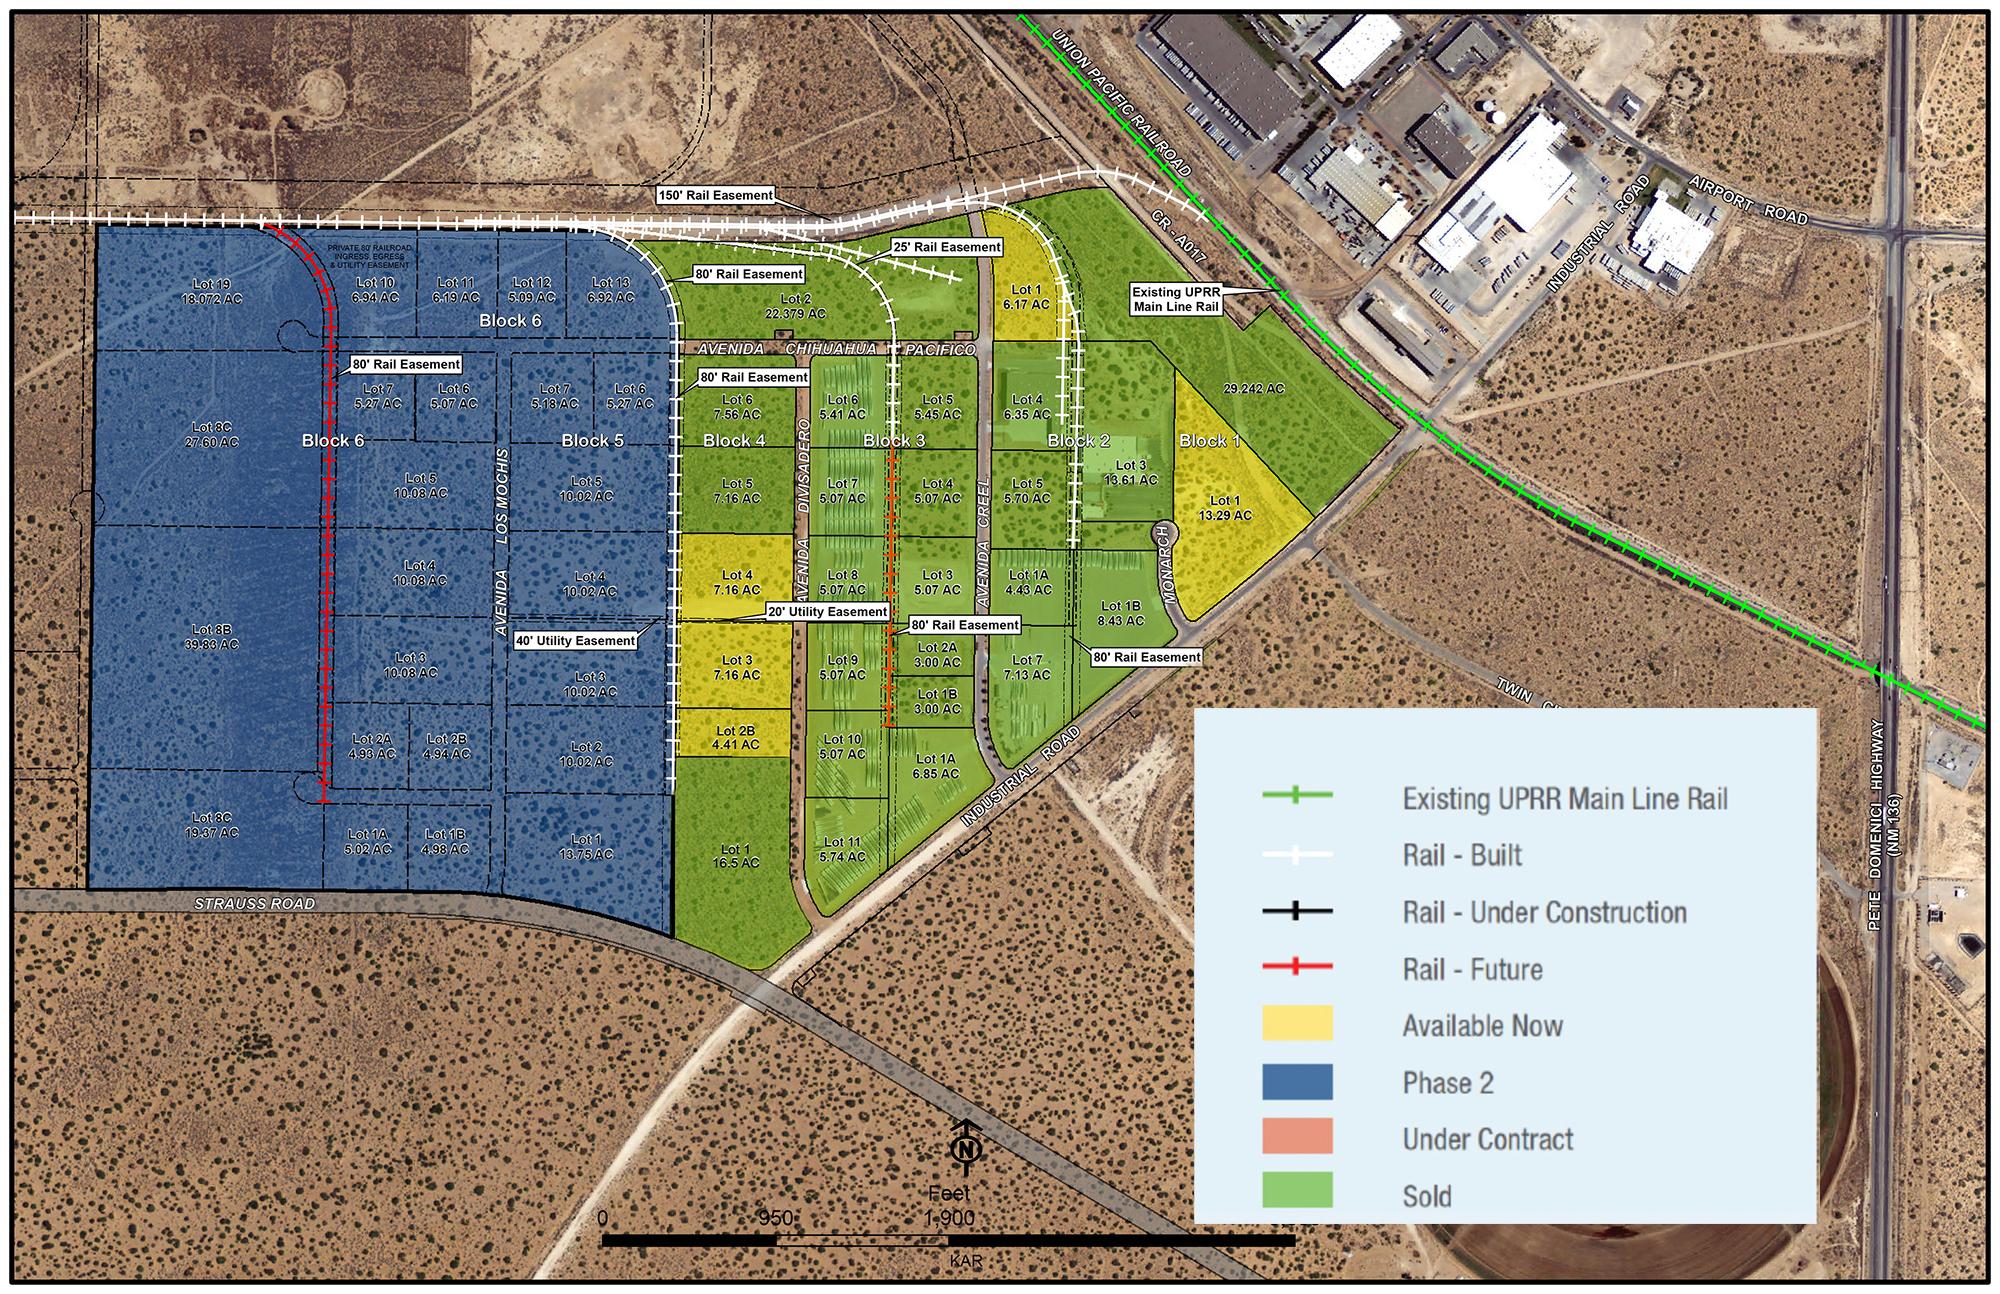 Santa Teresa2 Intermodal Logisitics Park Phase 2 Marketing 3.4.19